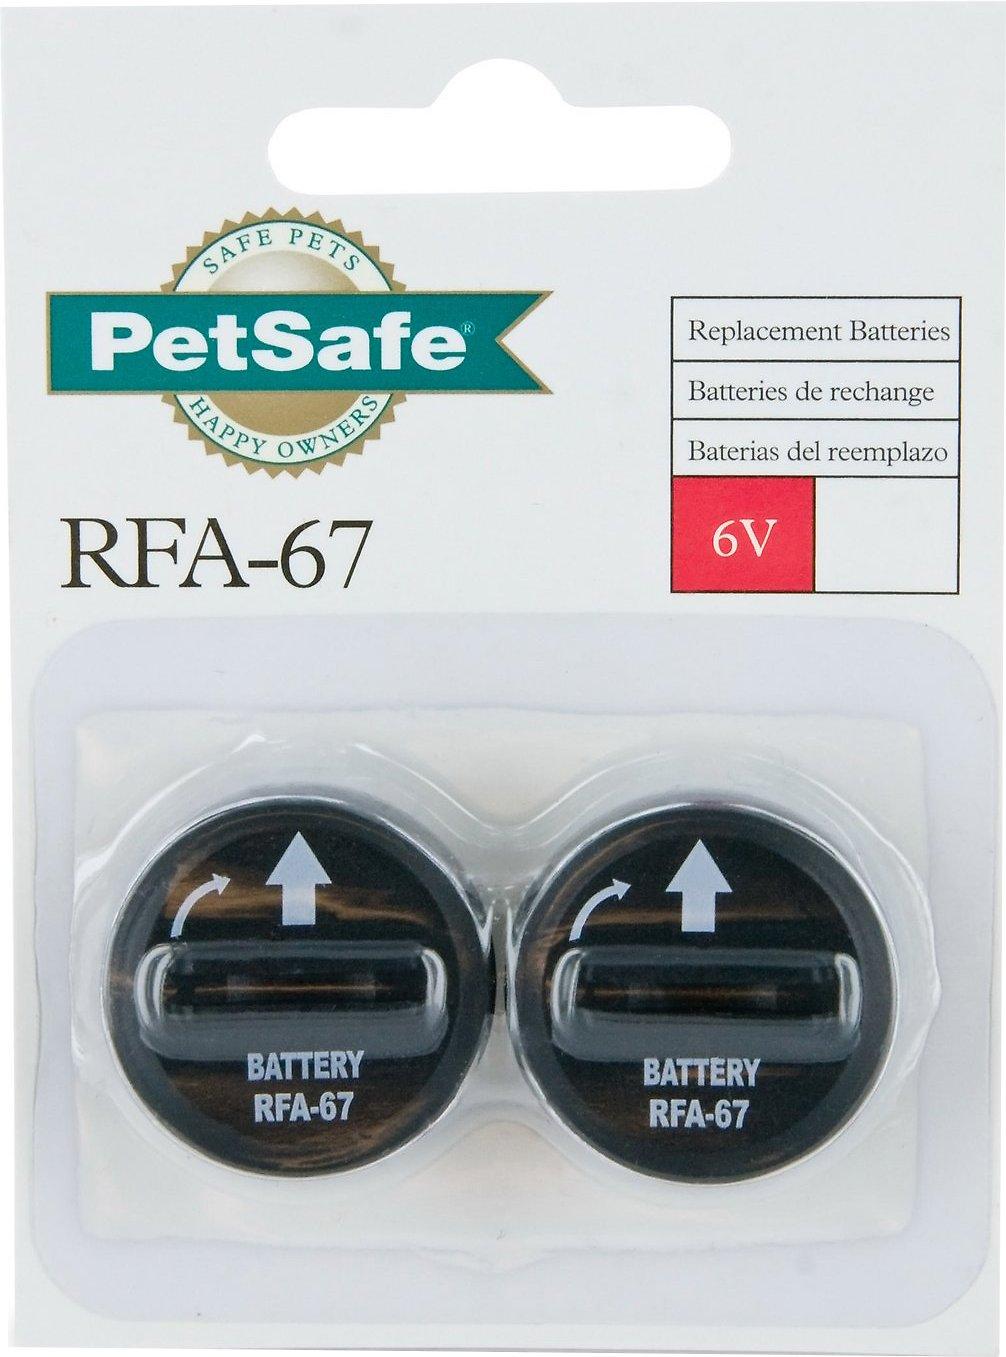 PetSafe 6-Volt RFA-67D Replacement Batteries, 2 pack Image